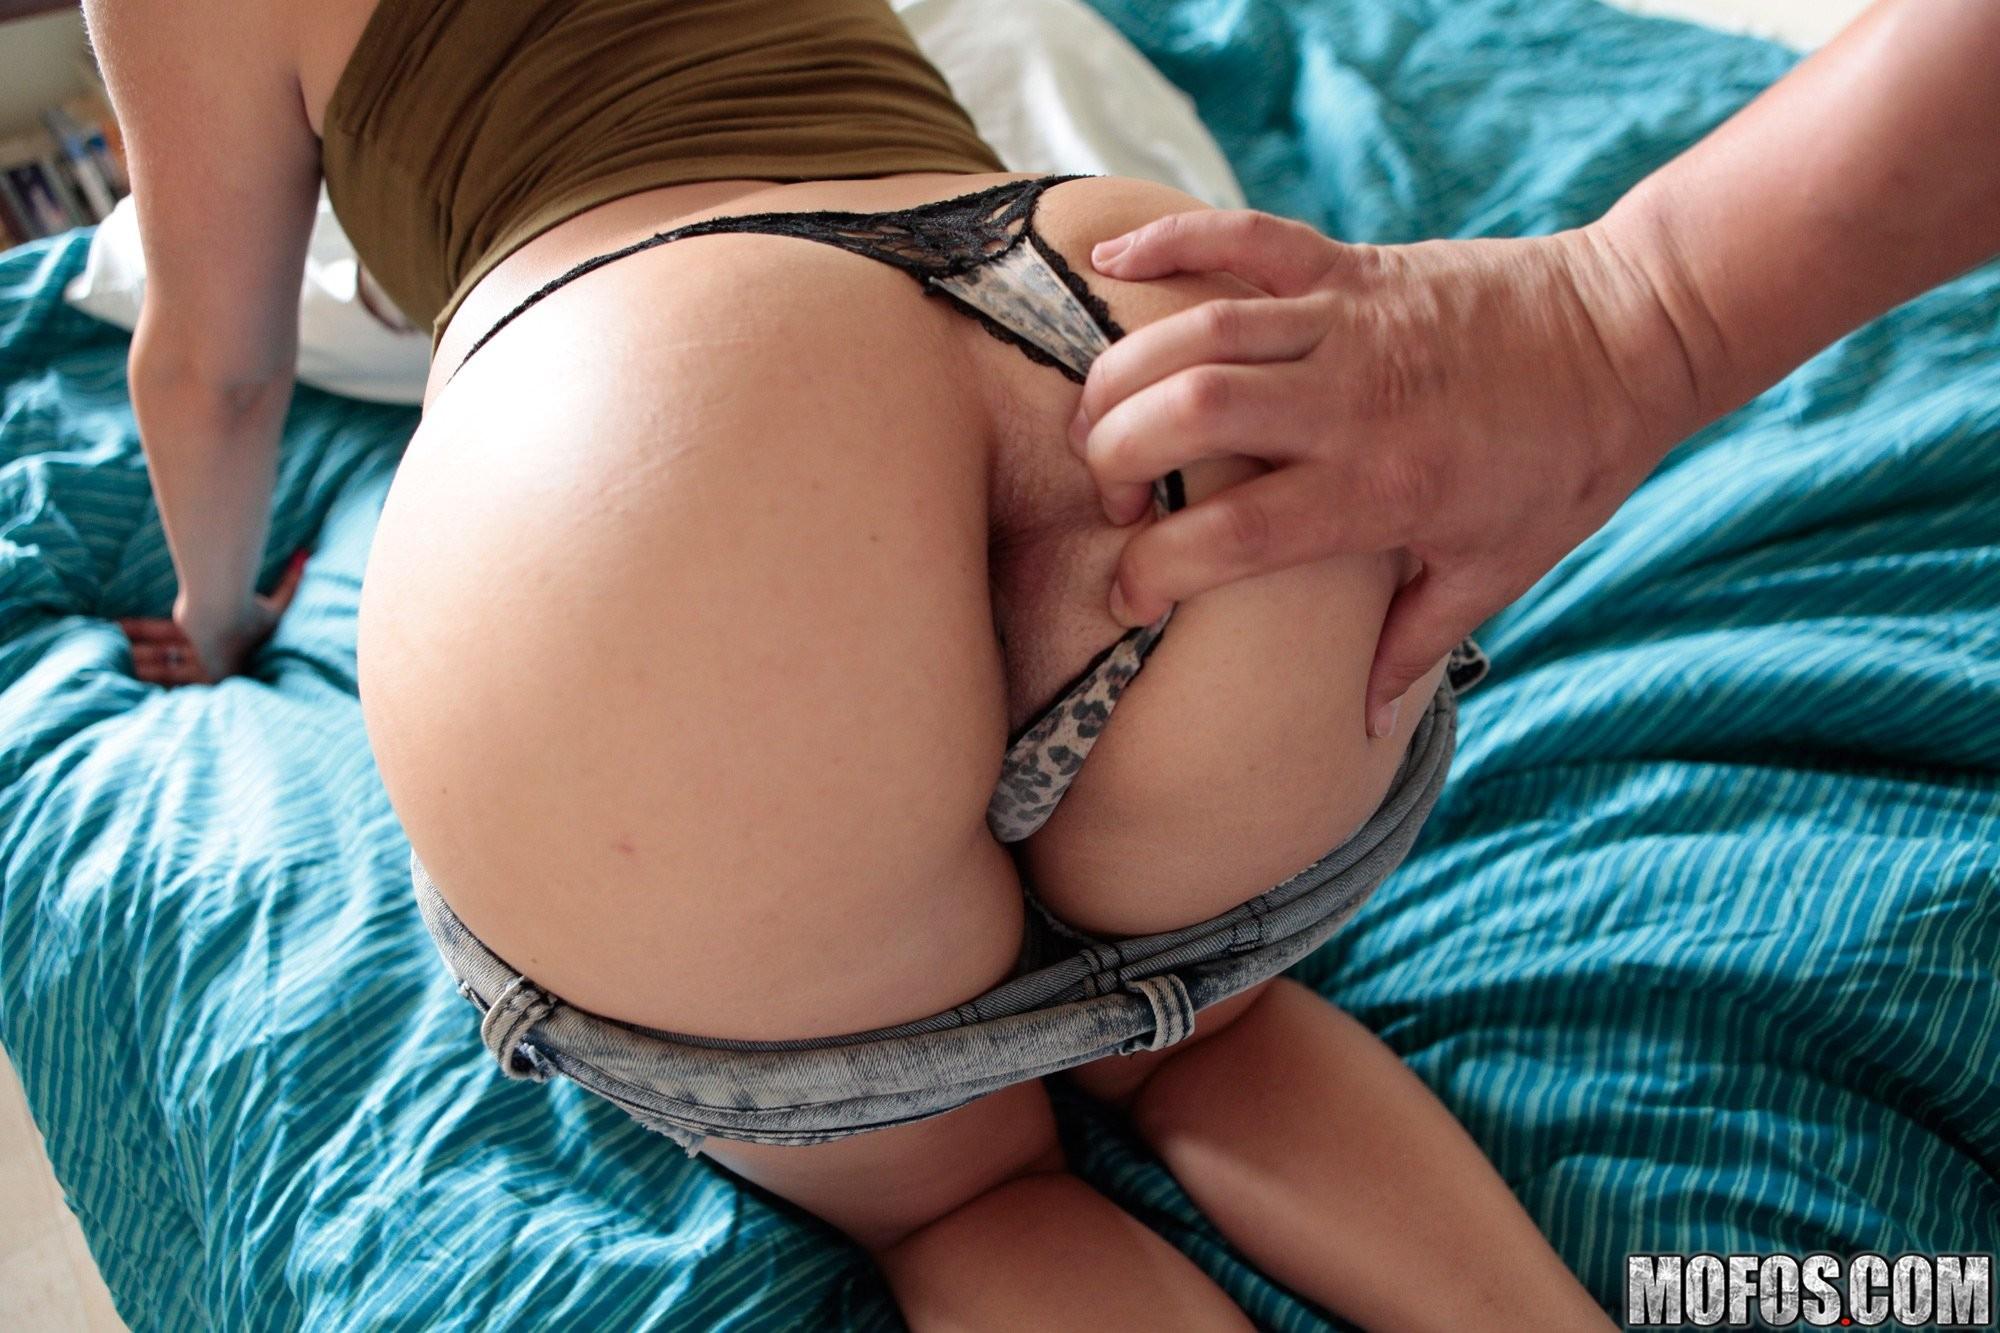 Real amateur butt sex